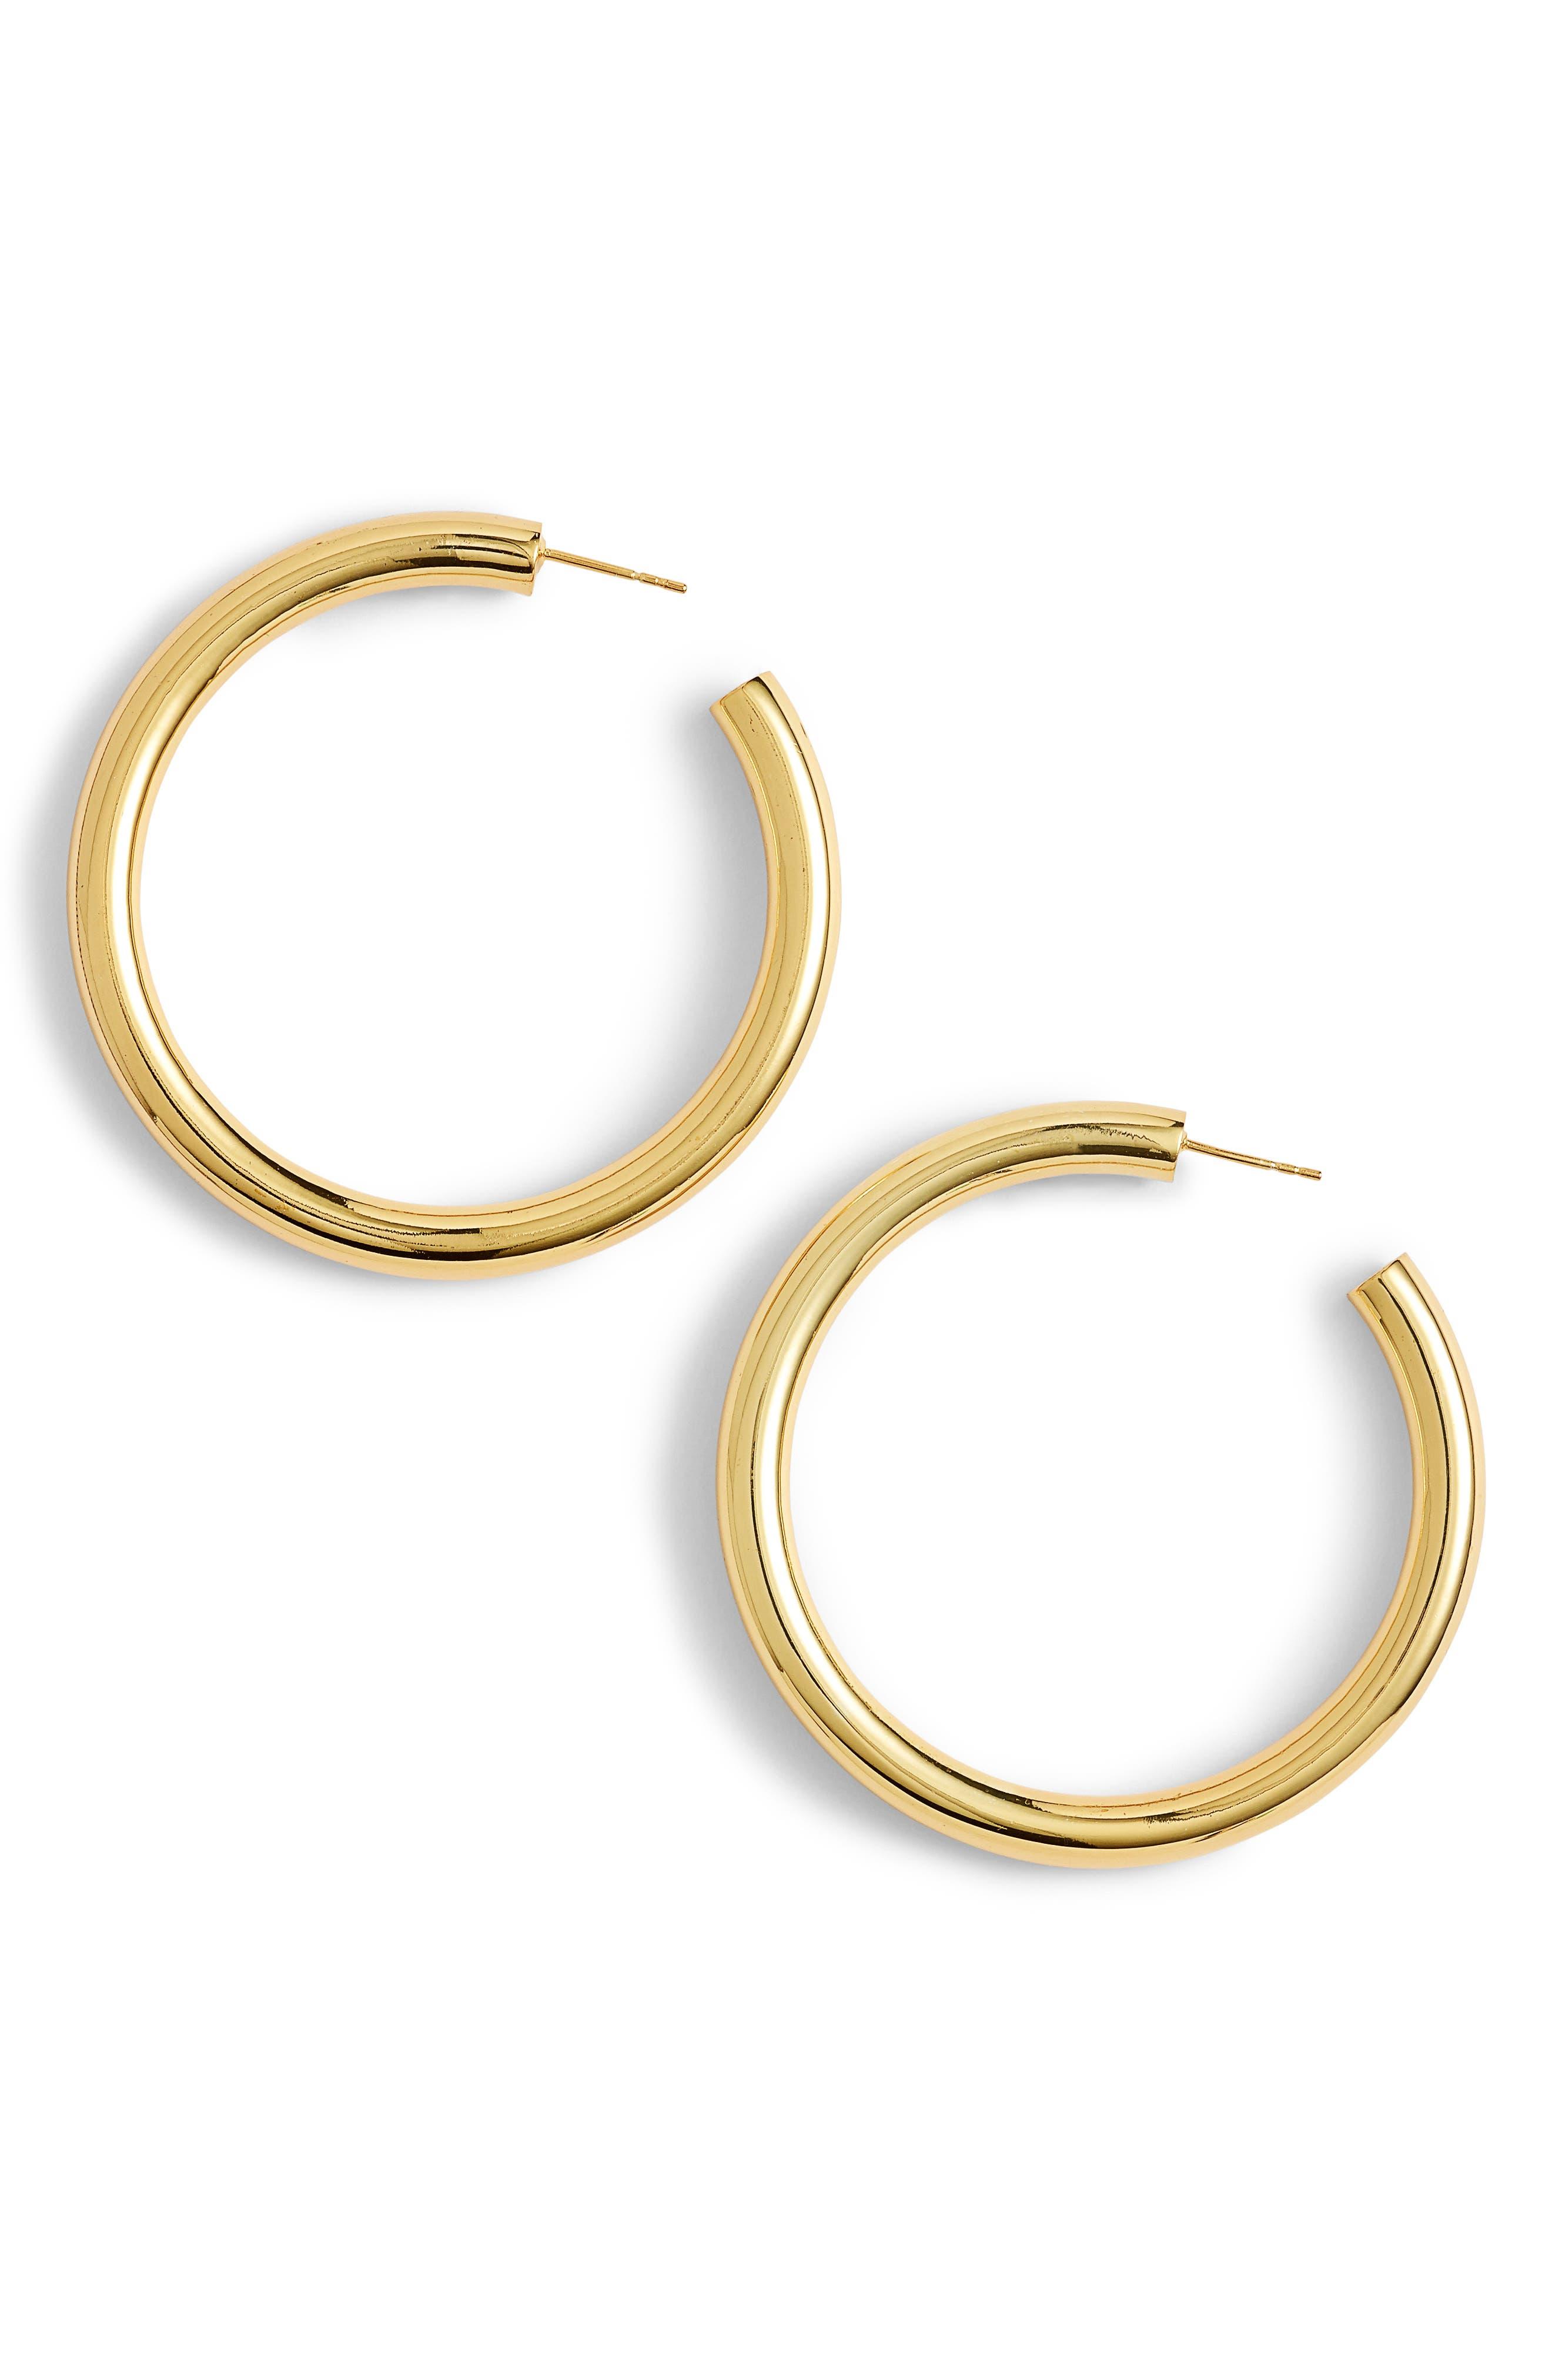 Hollow Hoop Earrings,                         Main,                         color, GOLD